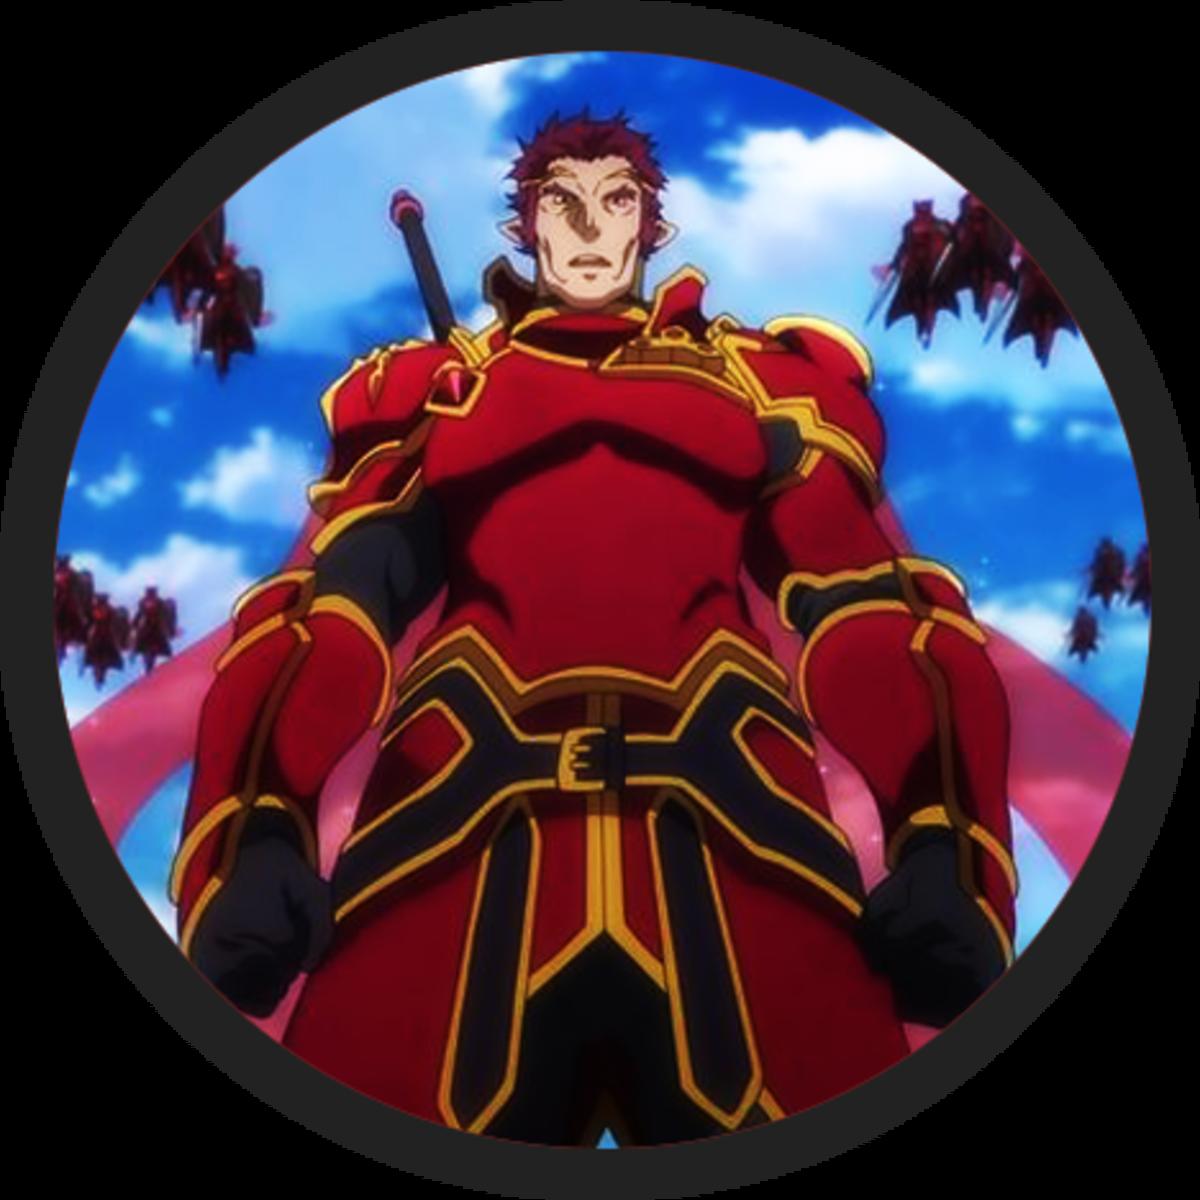 General Eugene ALO avatar